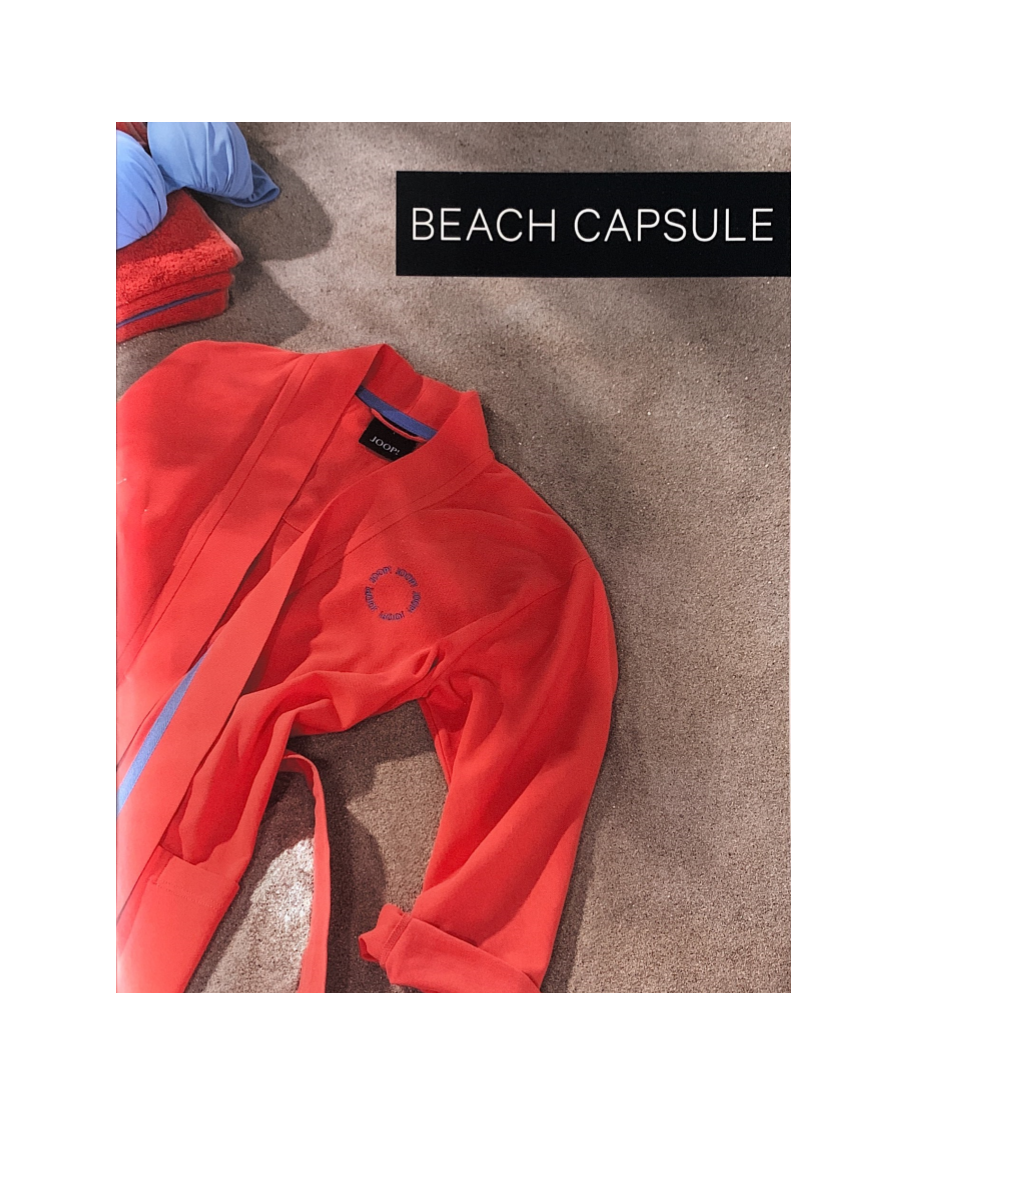 JOOP! Beach Capsule Damen Kimono leichter Bademantel Kollektion 2020